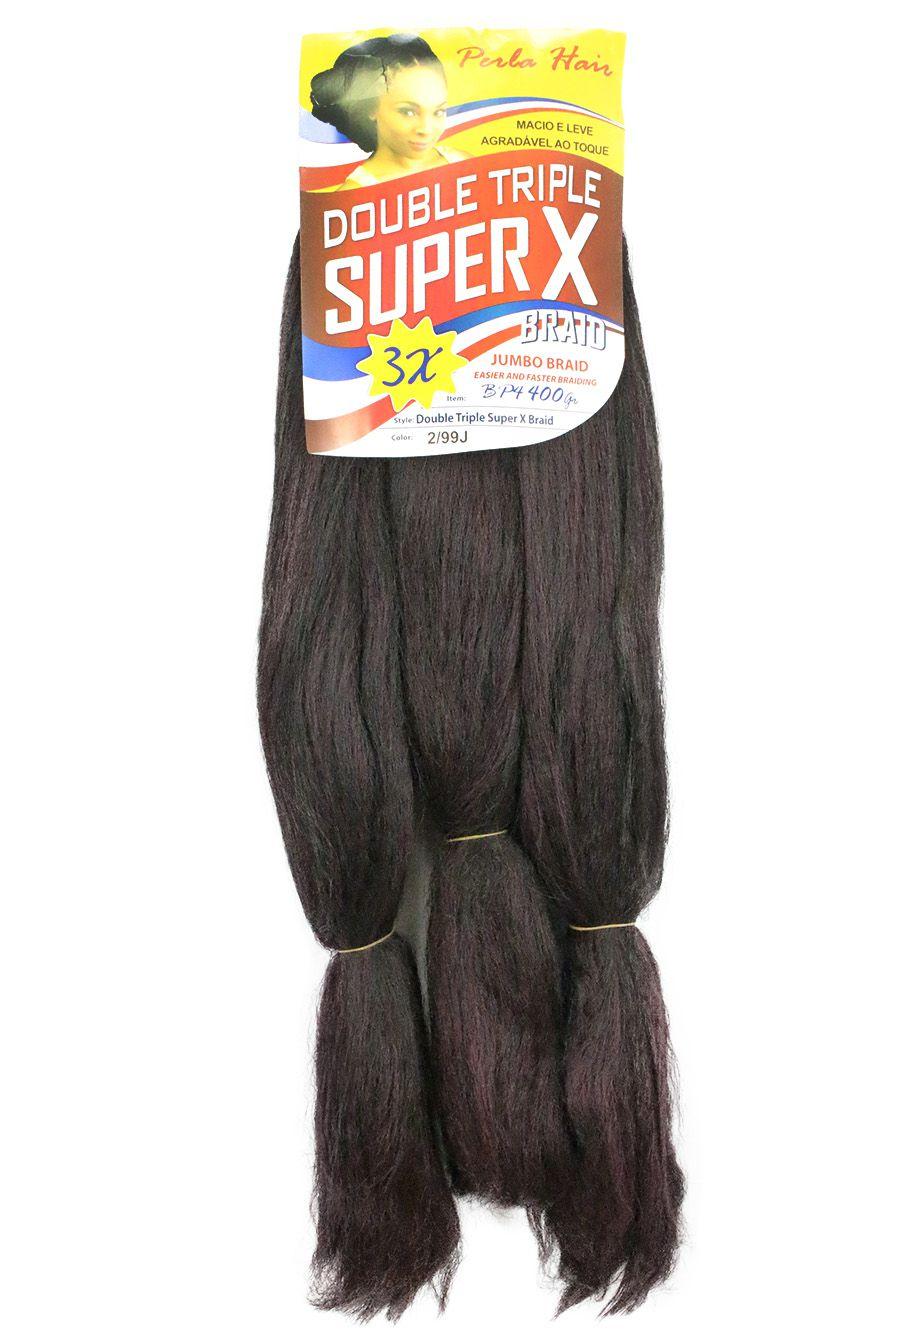 Cabelo Sintético - Zhang hair jumbo - Jumbão Super X (400g) - Cor 2/99J